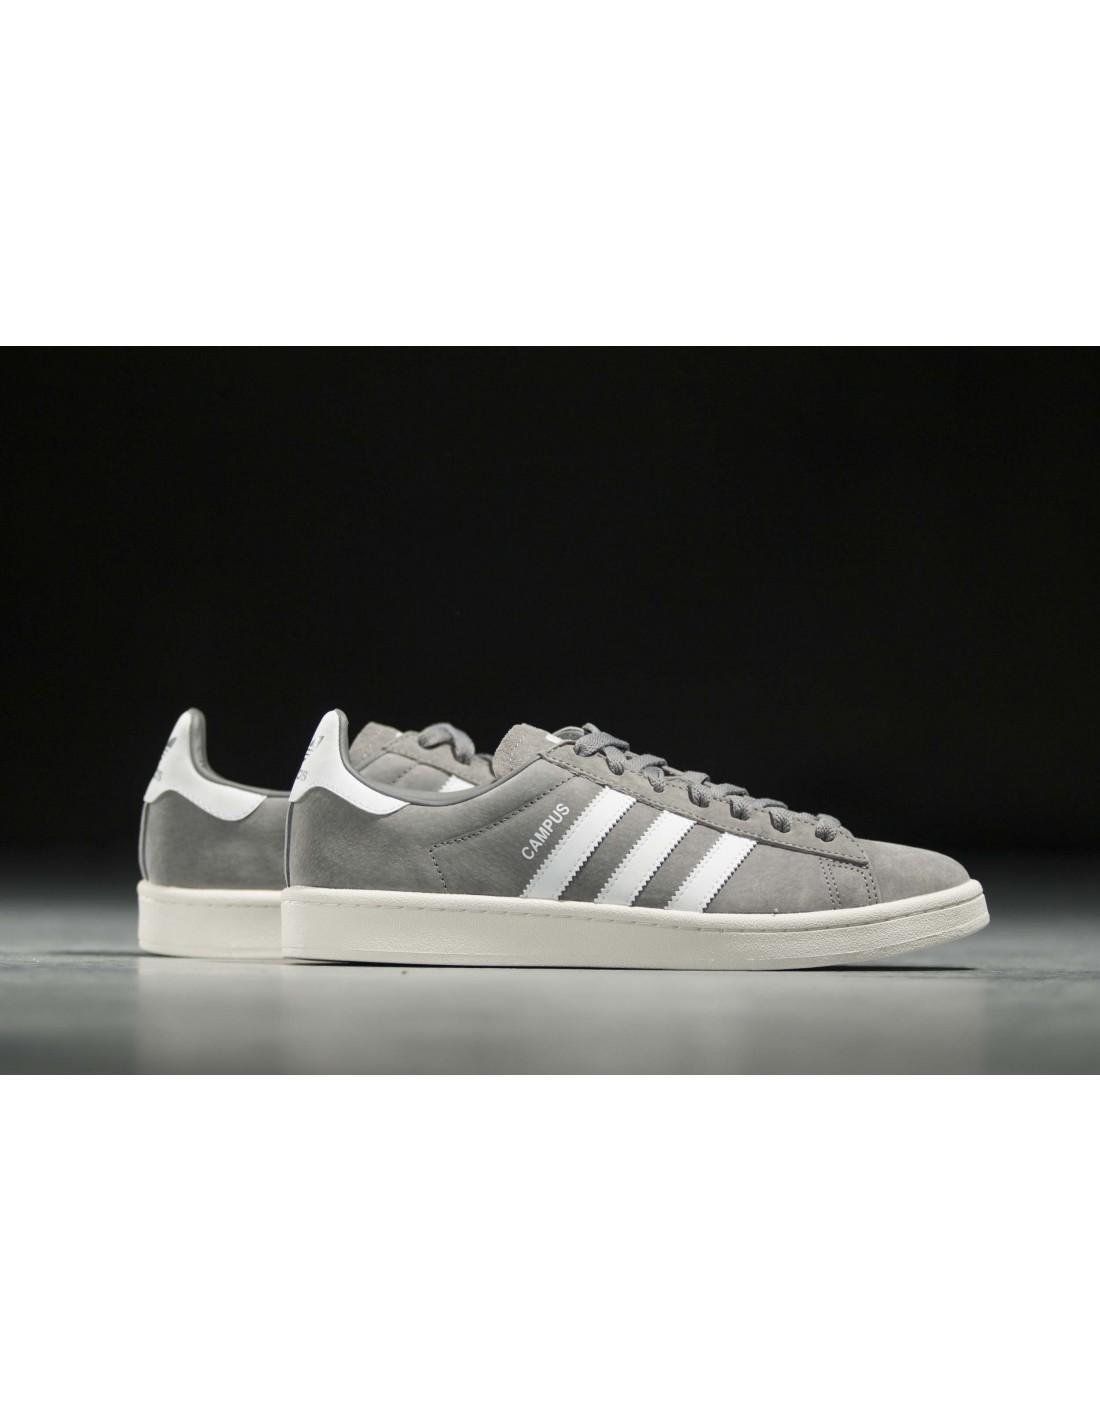 Adidas Originals Campus Men's Shoes Grey (BZ0085) www